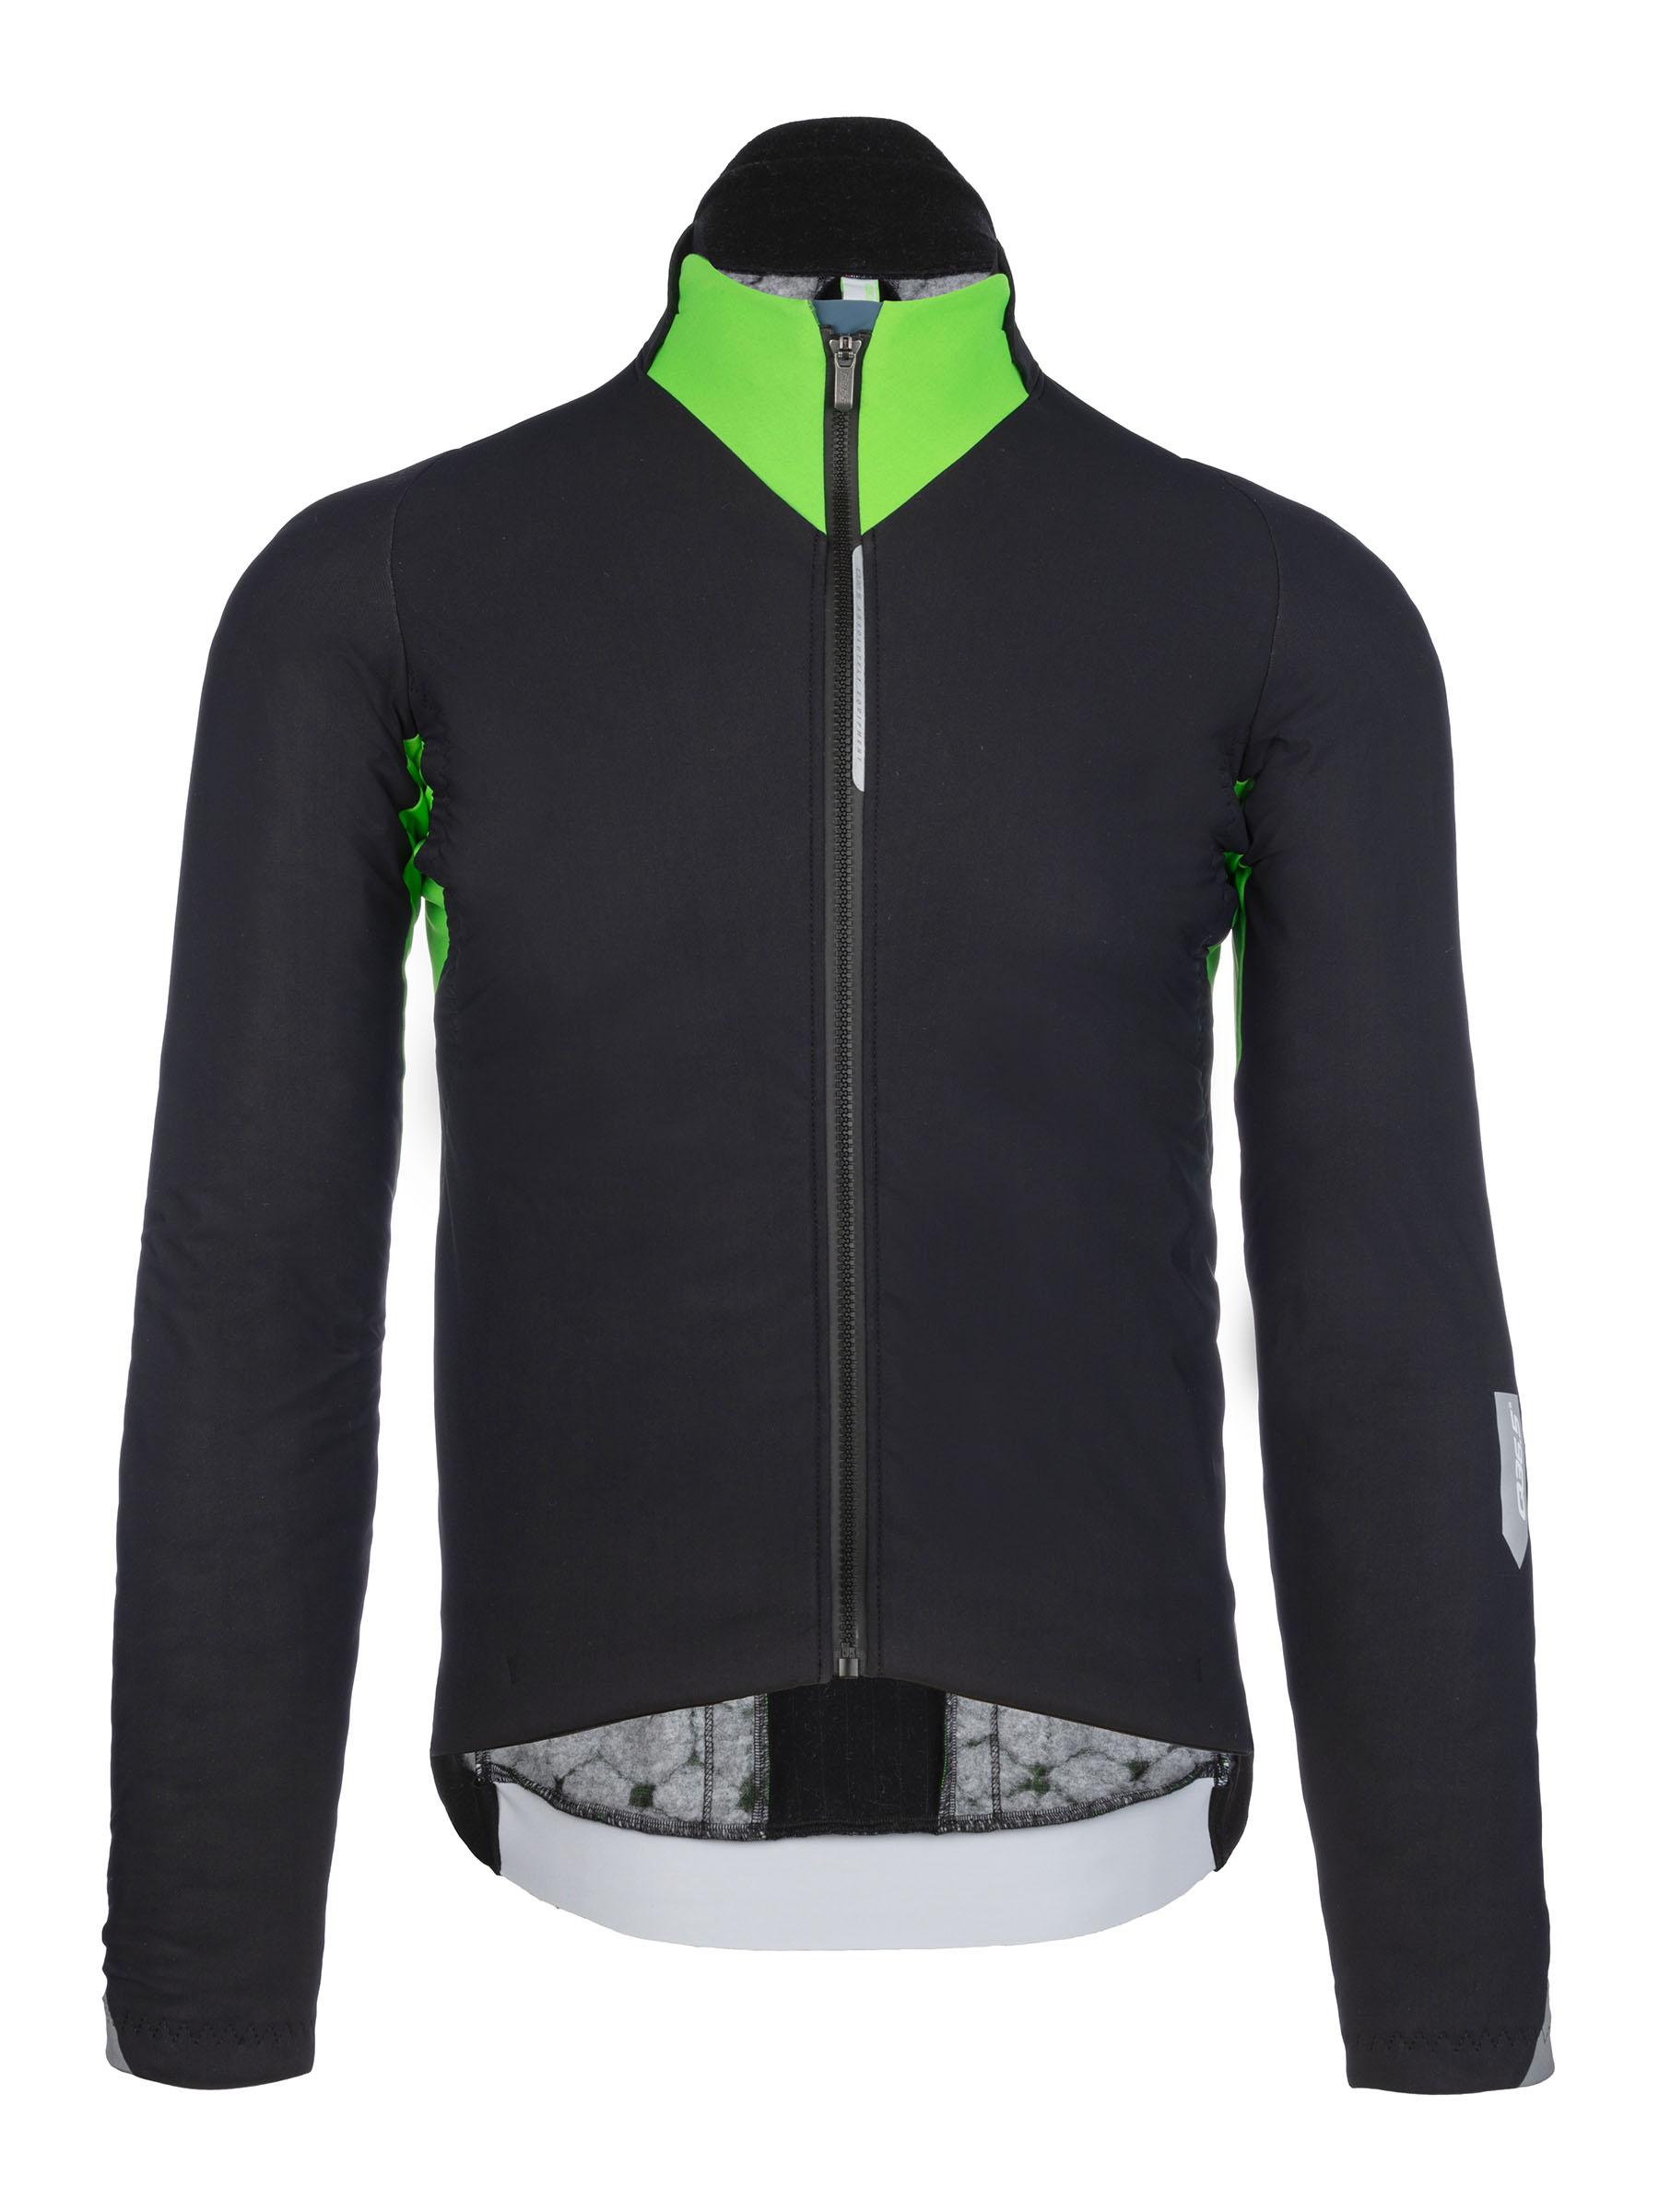 Chaqueta ciclismo invierno Interval Termica- 051.3 verde